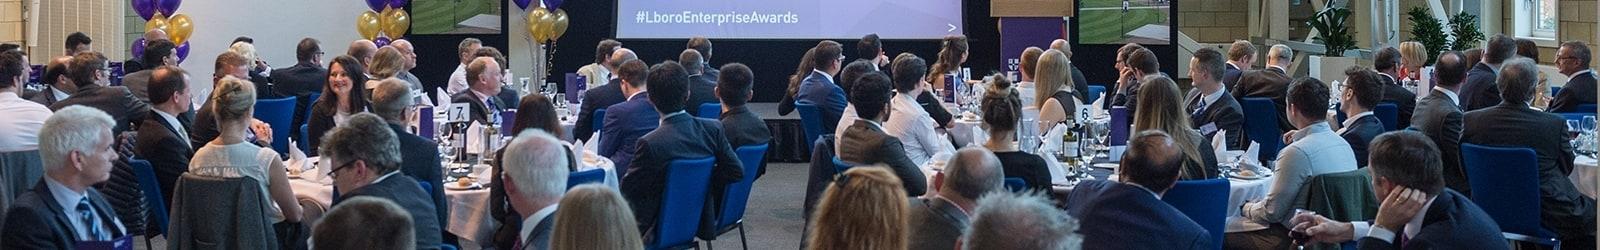 Enterprise Awards Event